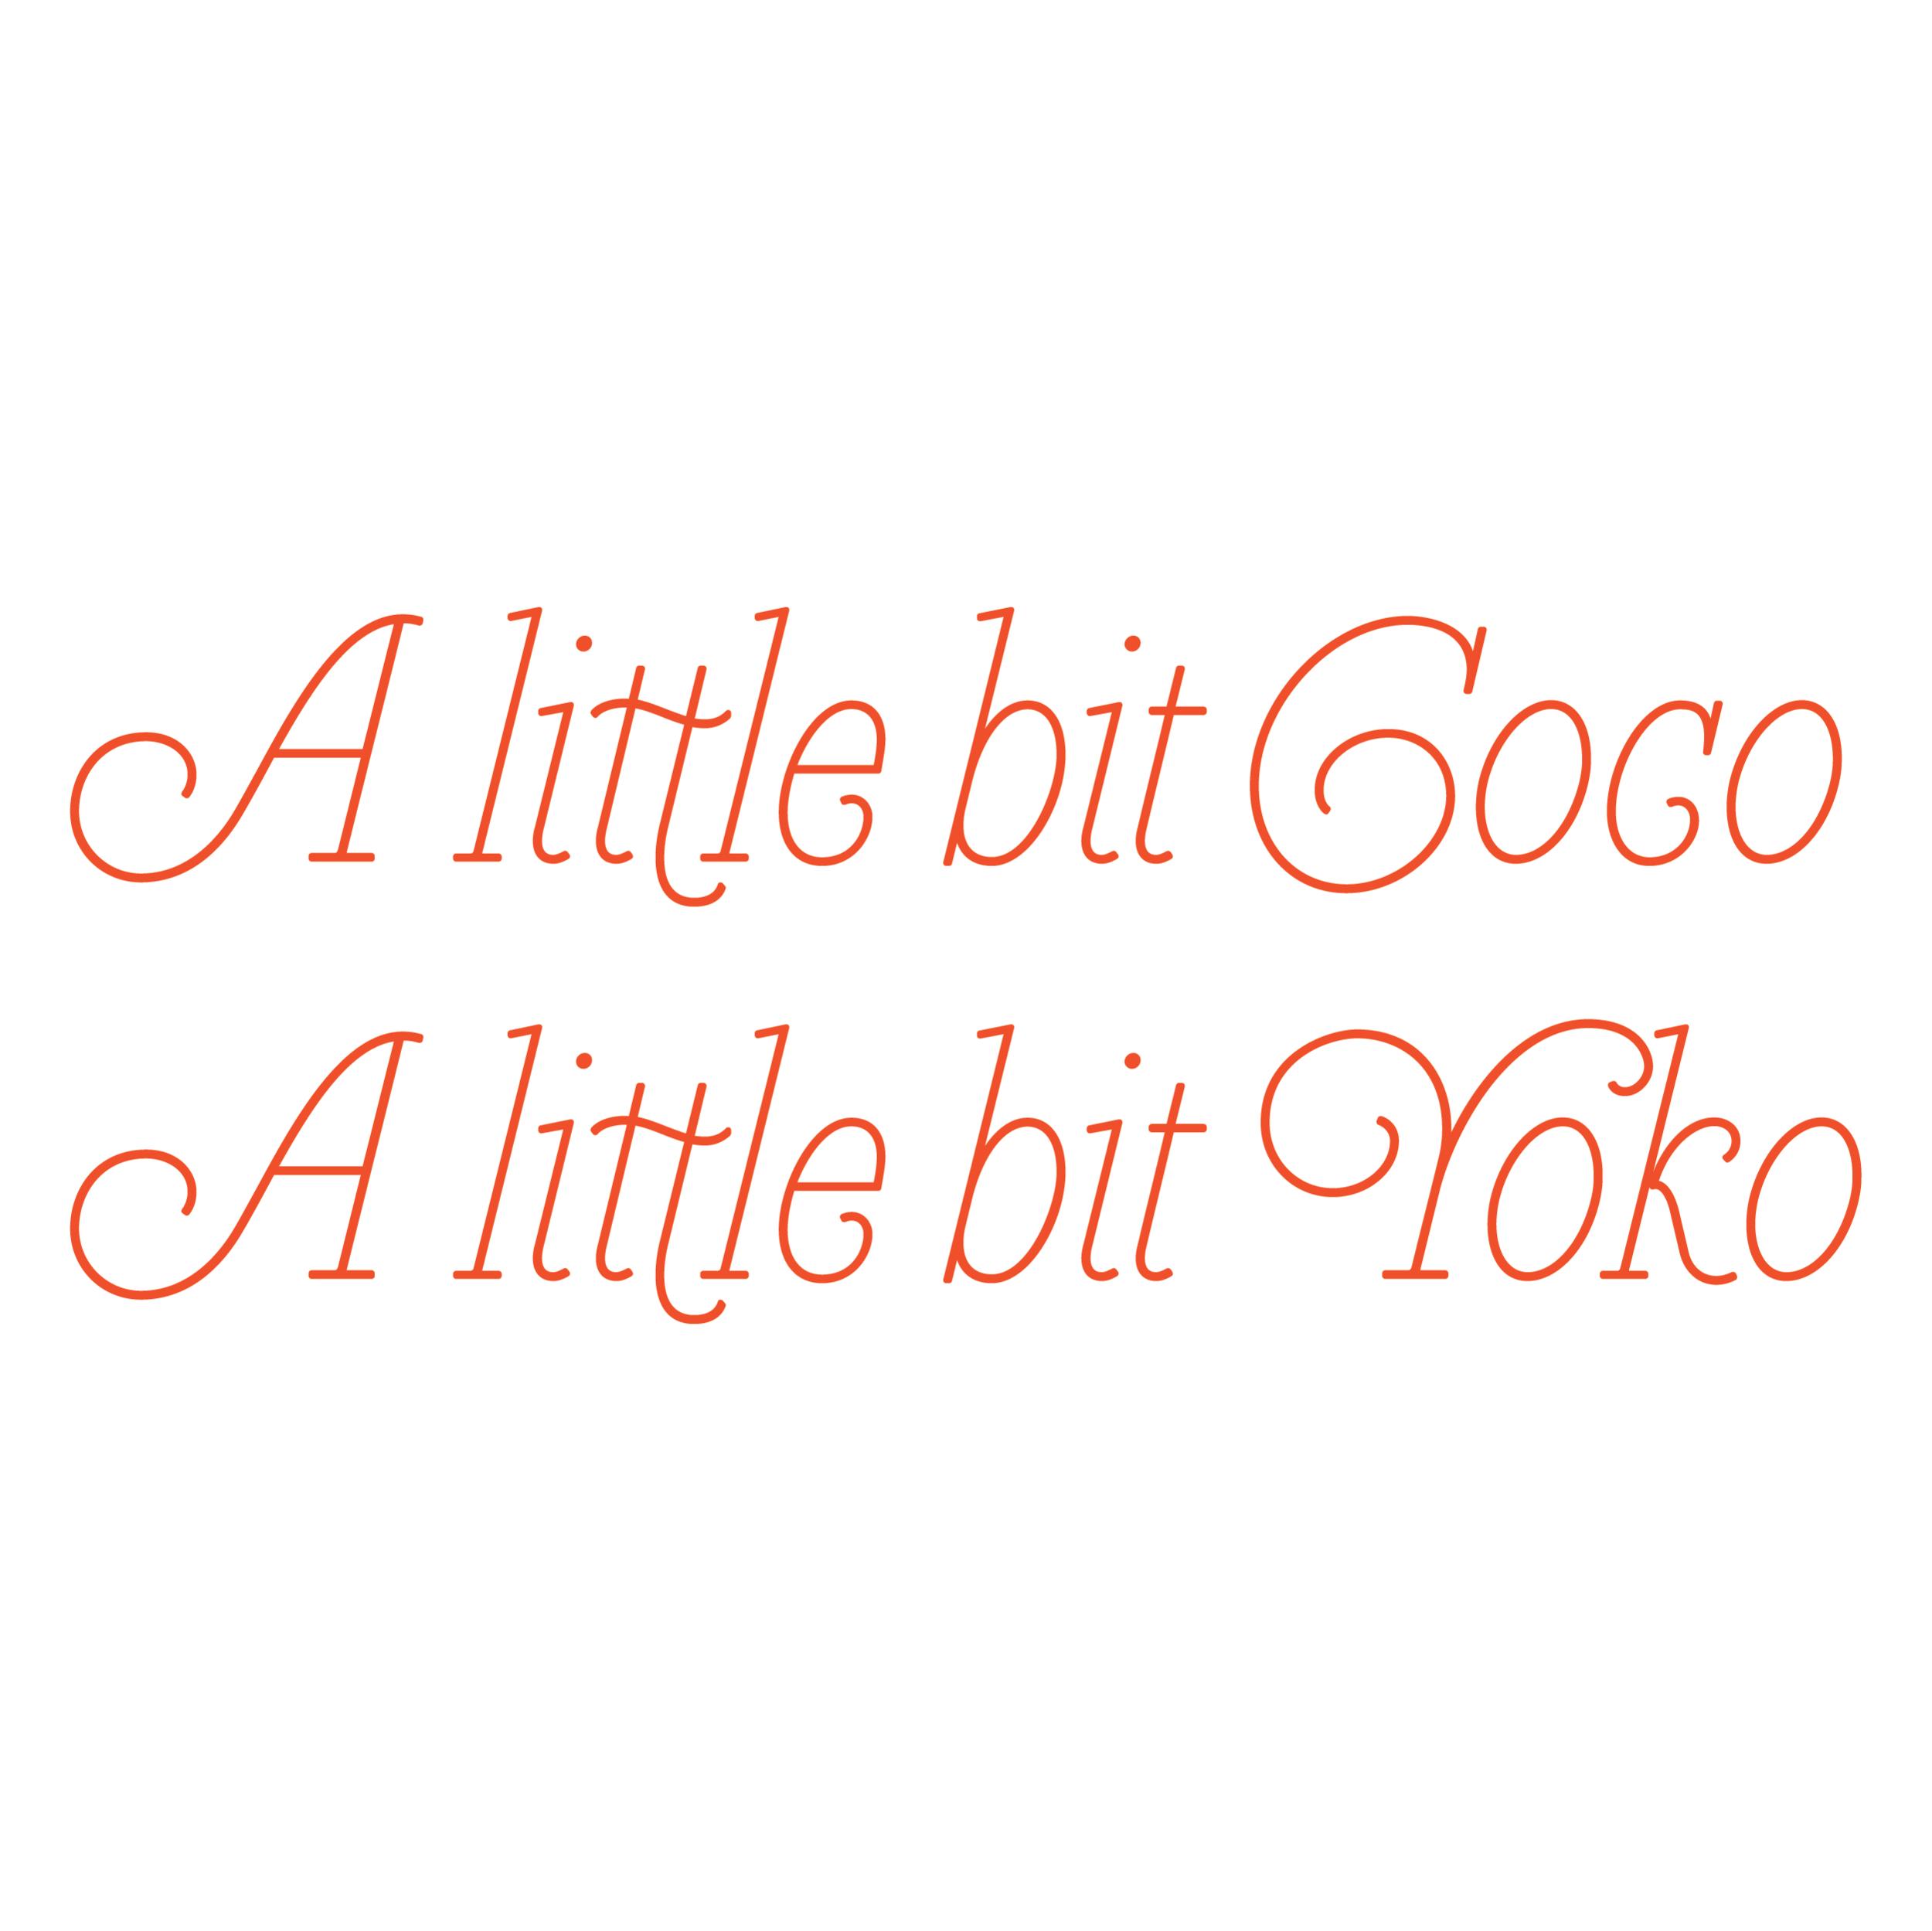 Coco + Yoko